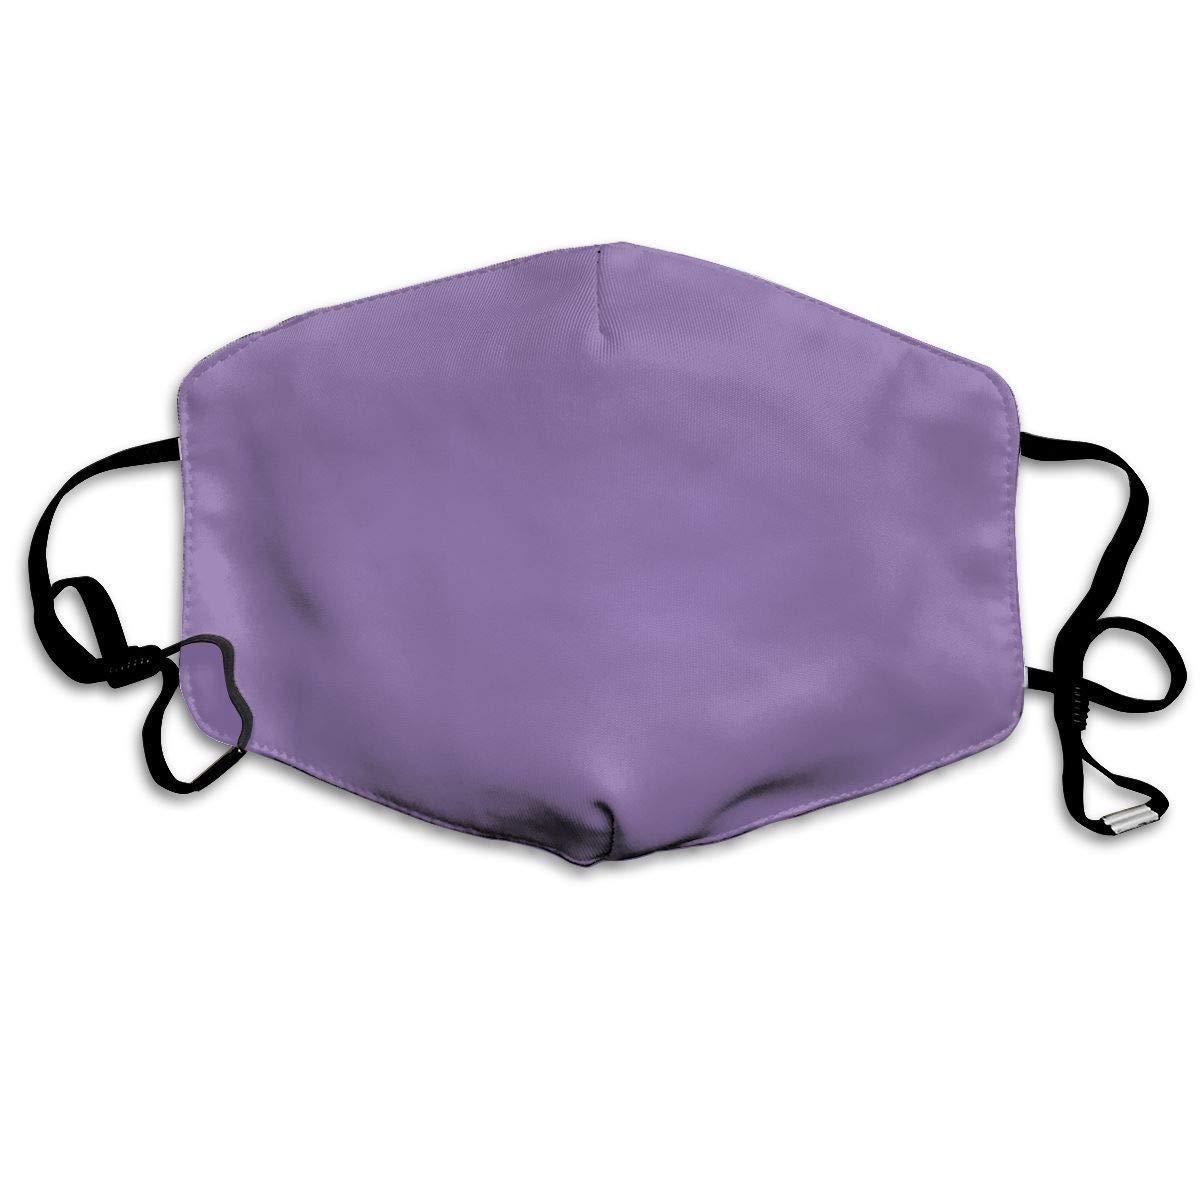 Face Masks Anti-Dust Mouth Cover Unique Lavender Purple Solid Color Washable And Reusable Mask Warm Windproof For Women Men Boys